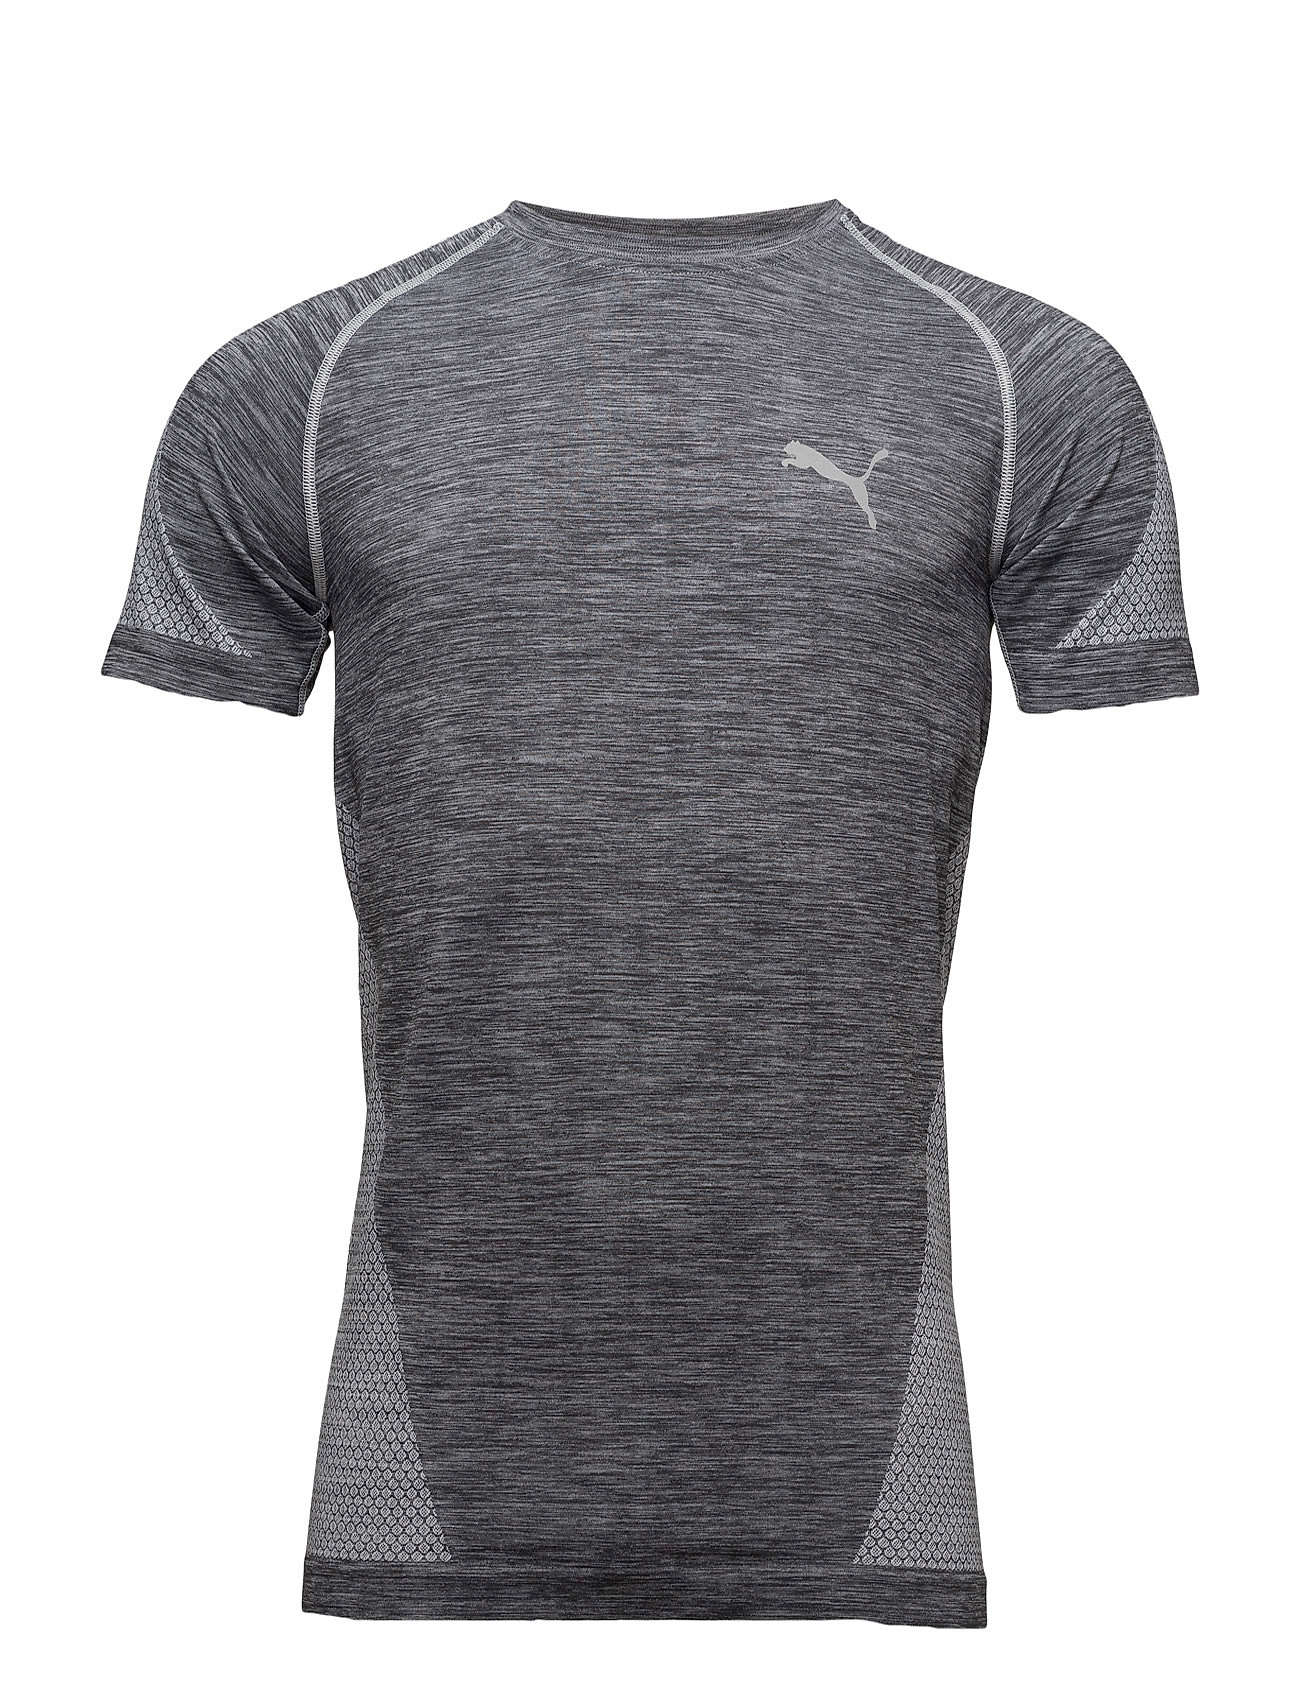 Evoknit Best Tee Puma Løbe t-shirts til Herrer i